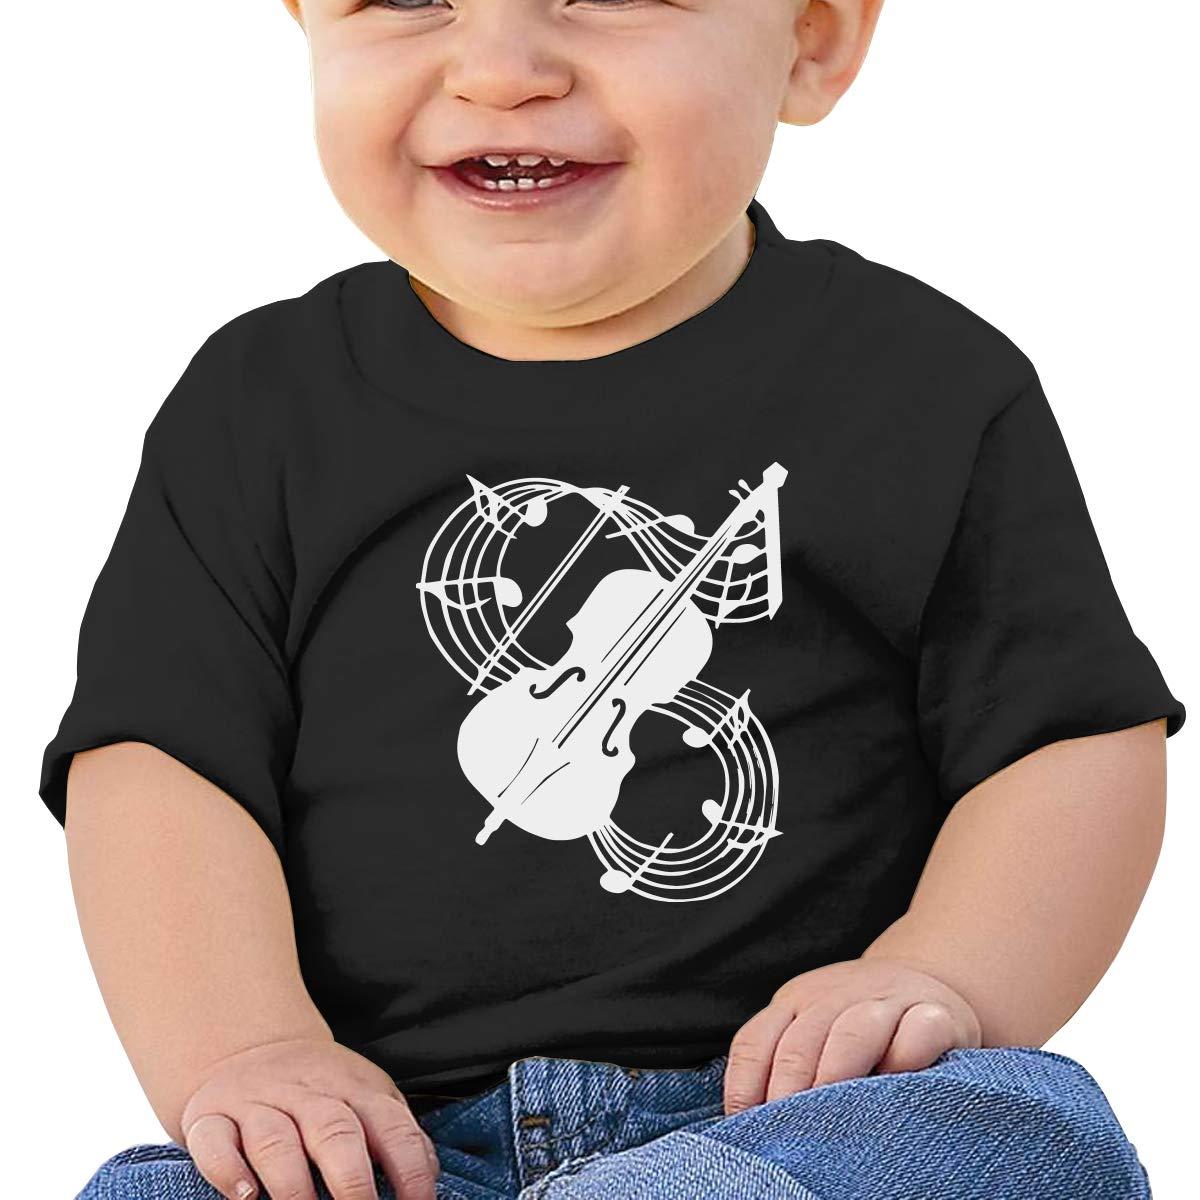 Violin Toddler Short-Sleeve Tee for Boy Girl Infant Kids T-Shirt On Newborn 6-18 Months Musical Note